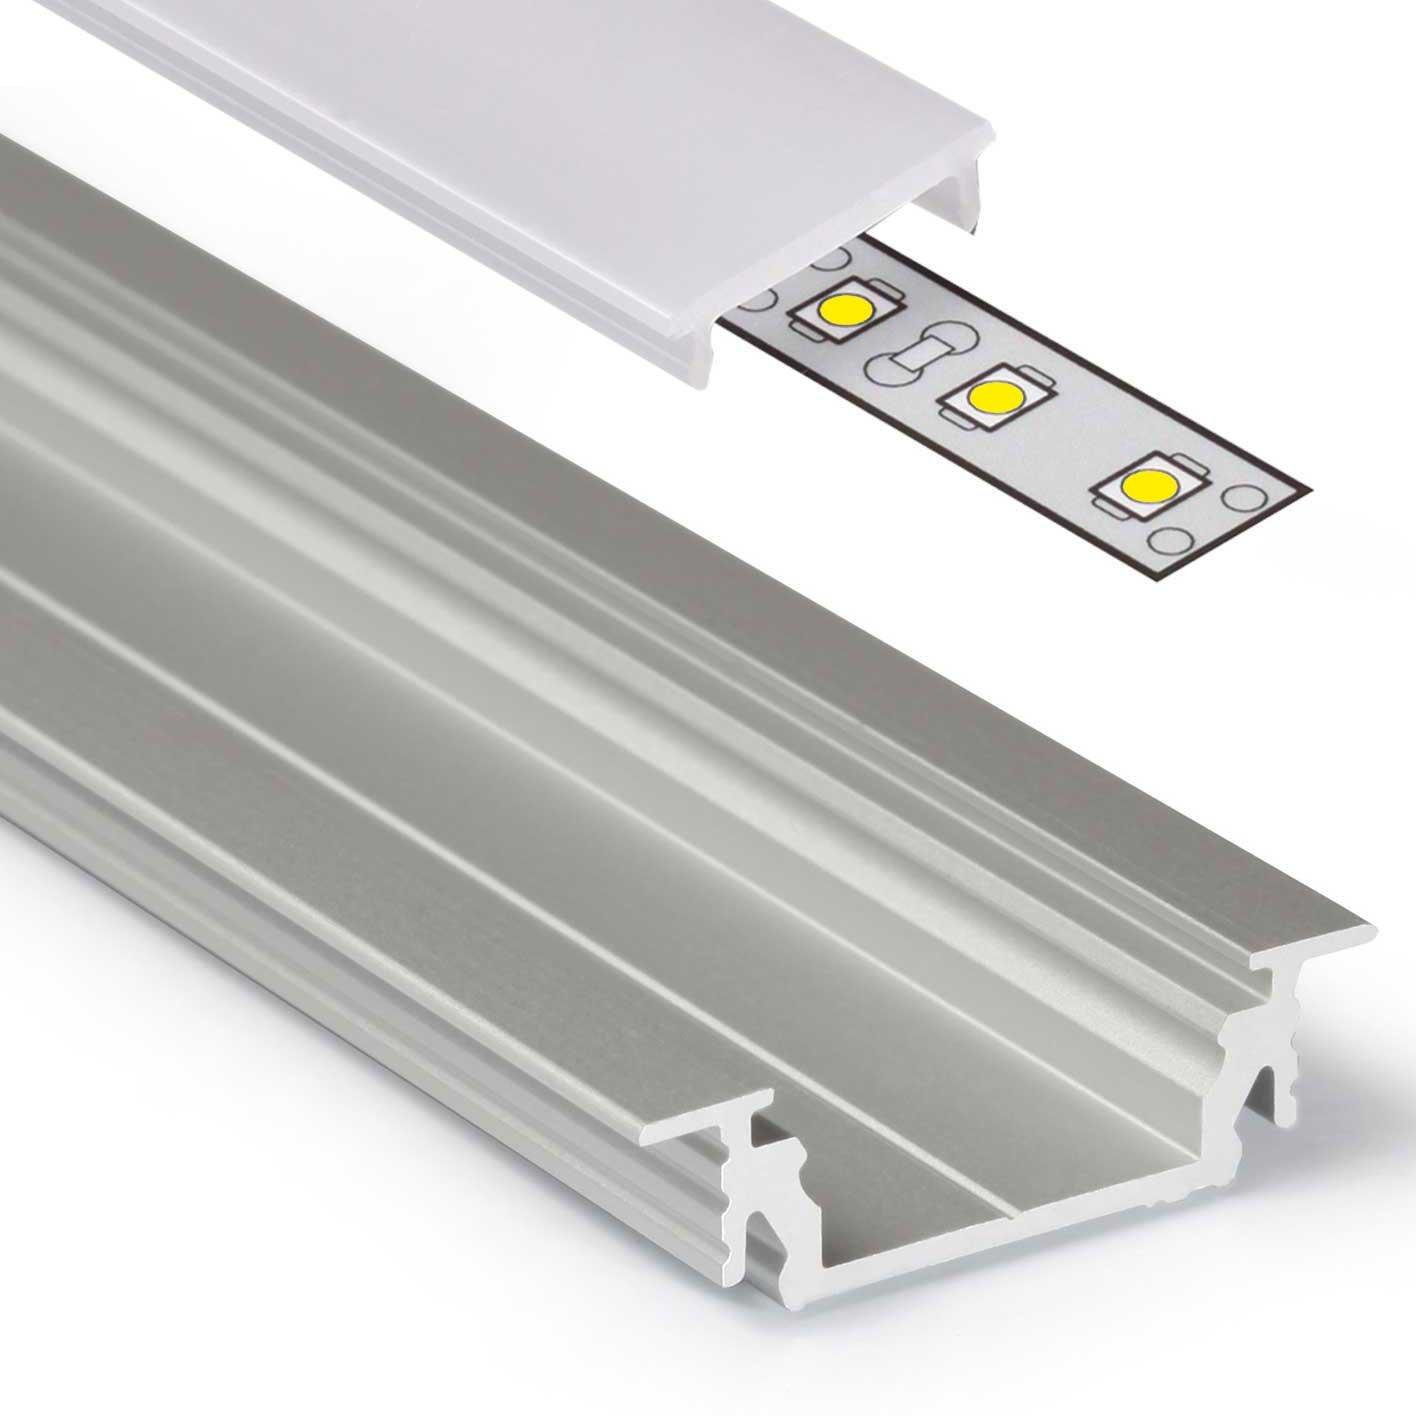 2m Aluprofil GROOVE14 (GR14) Aluminium Profil-Leiste eloxiert für ...